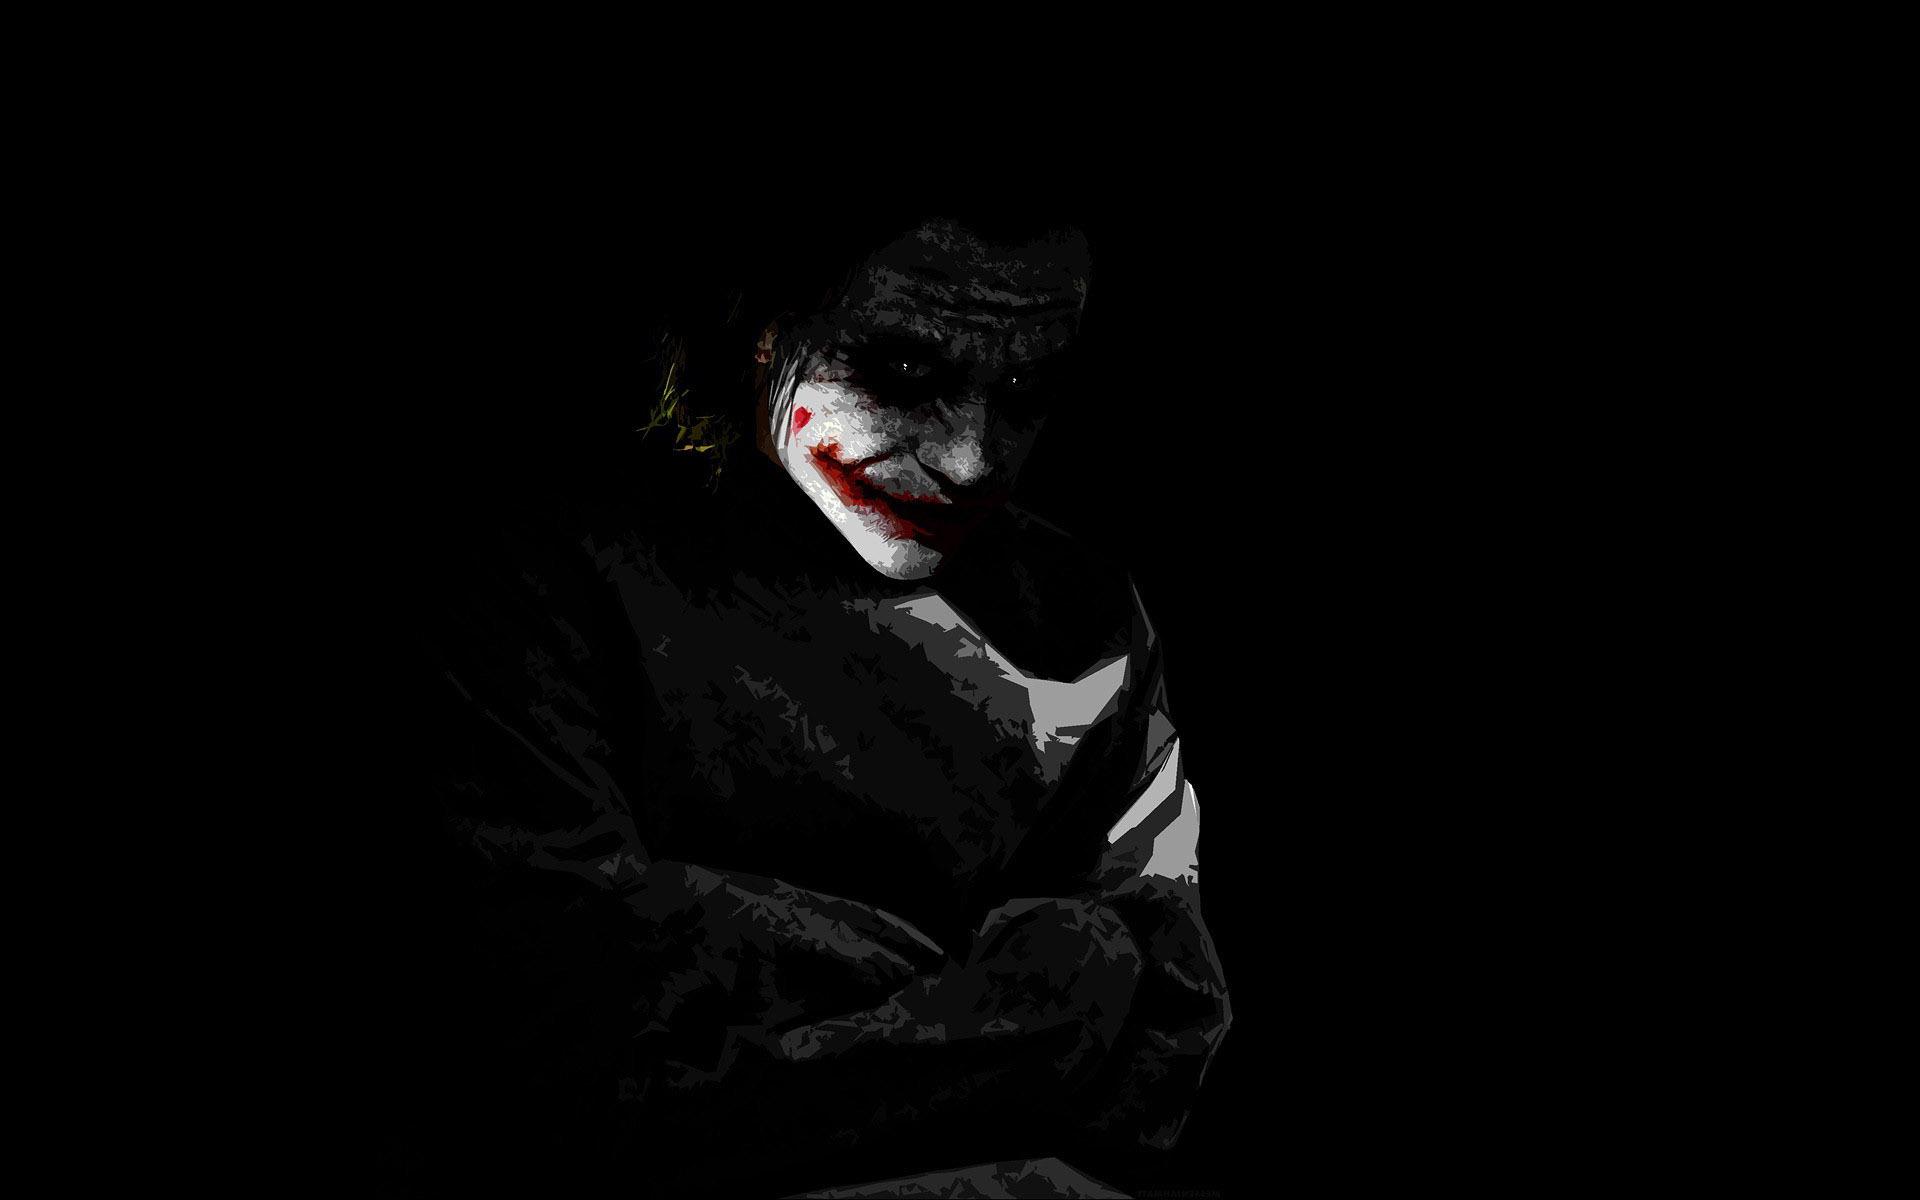 the joker digital art hd wallpaper 1920x1200 6381jpg 1920x1200